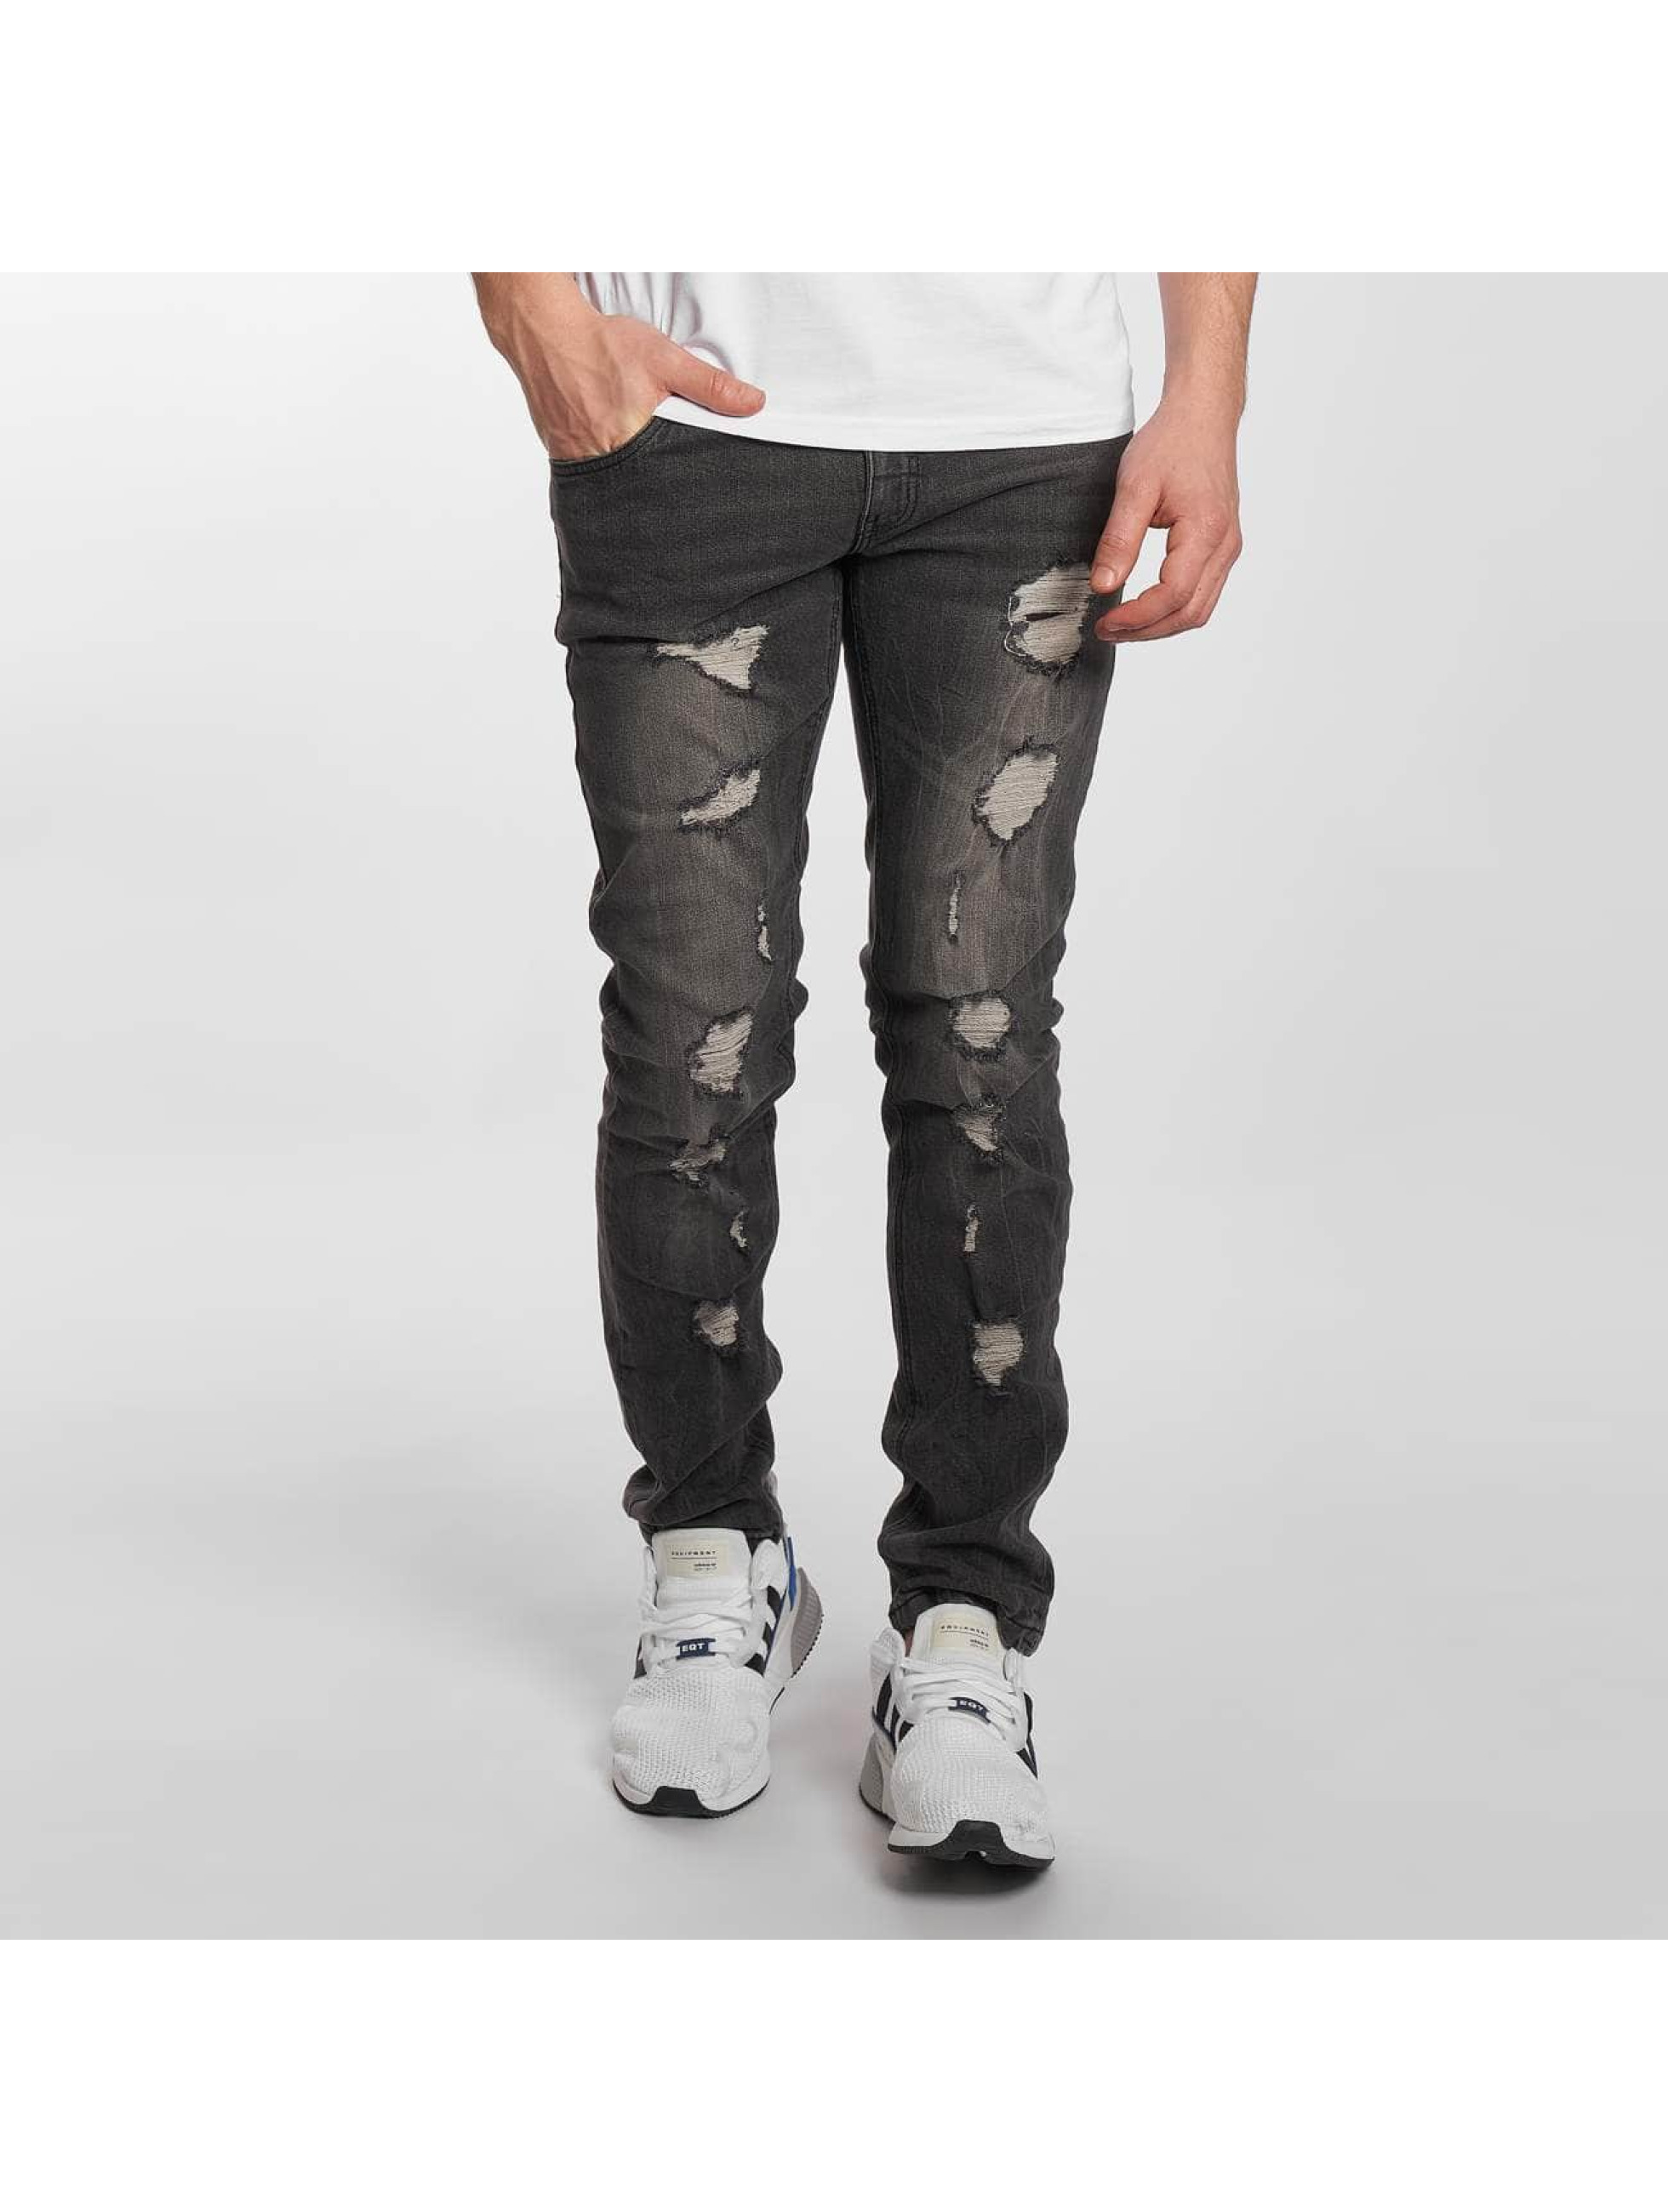 shine original herren jeans skinny jeans woody. Black Bedroom Furniture Sets. Home Design Ideas